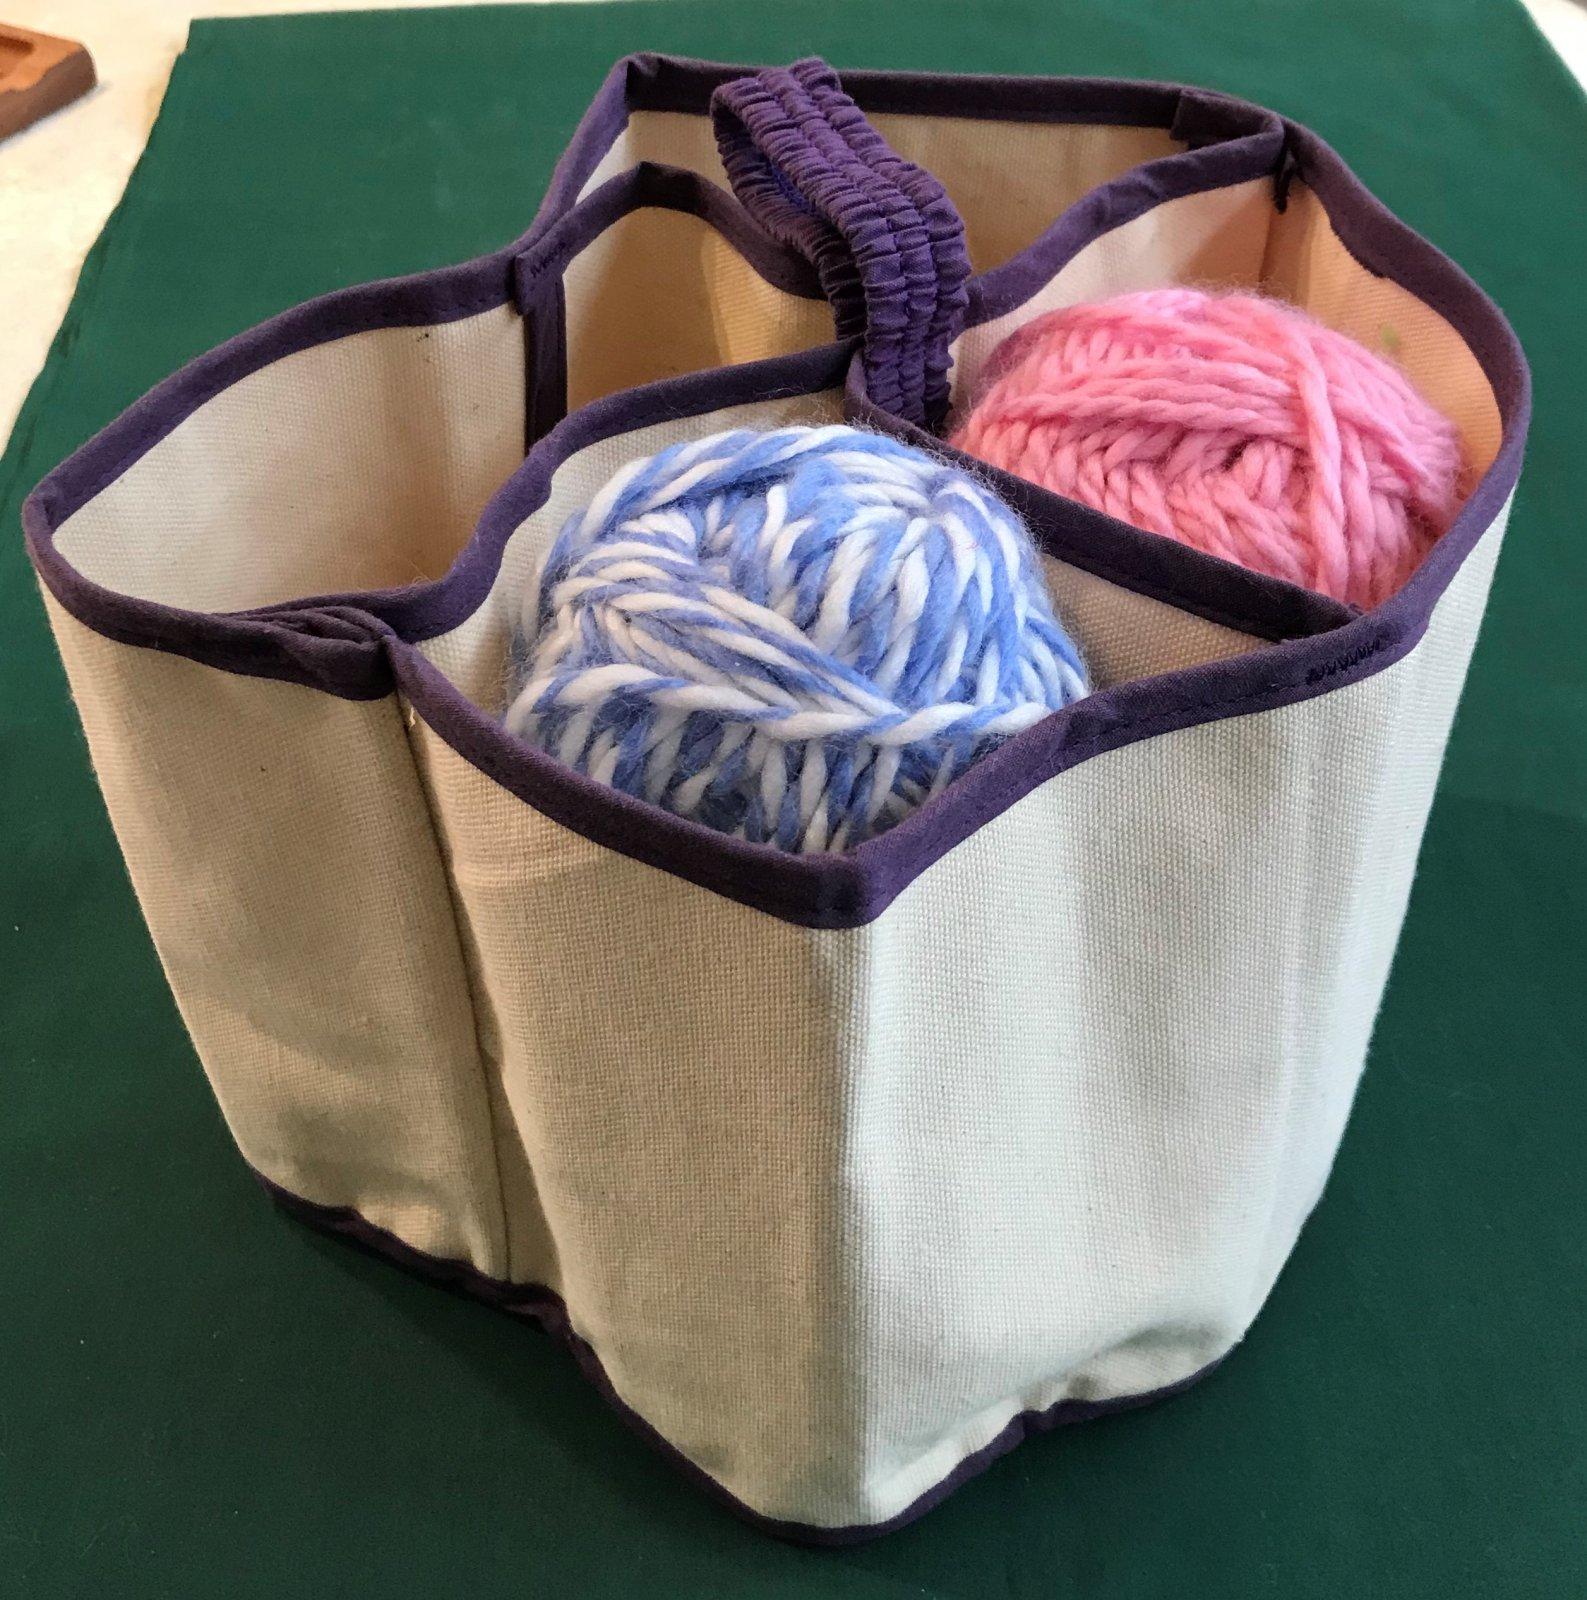 Knitting Nest with 5 Large Yarn Pockets